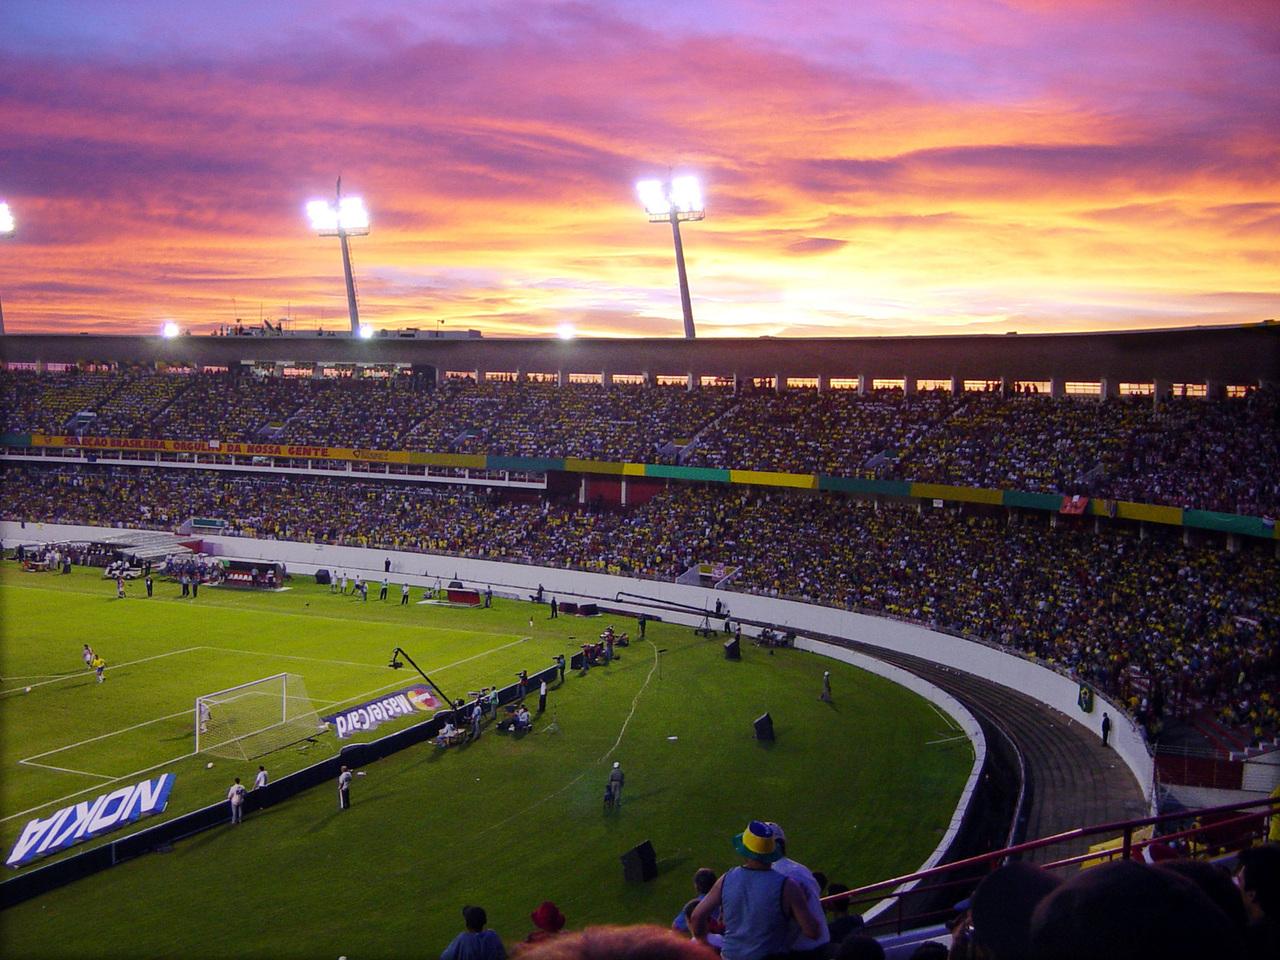 football-stadium-1-1540703-1280x960